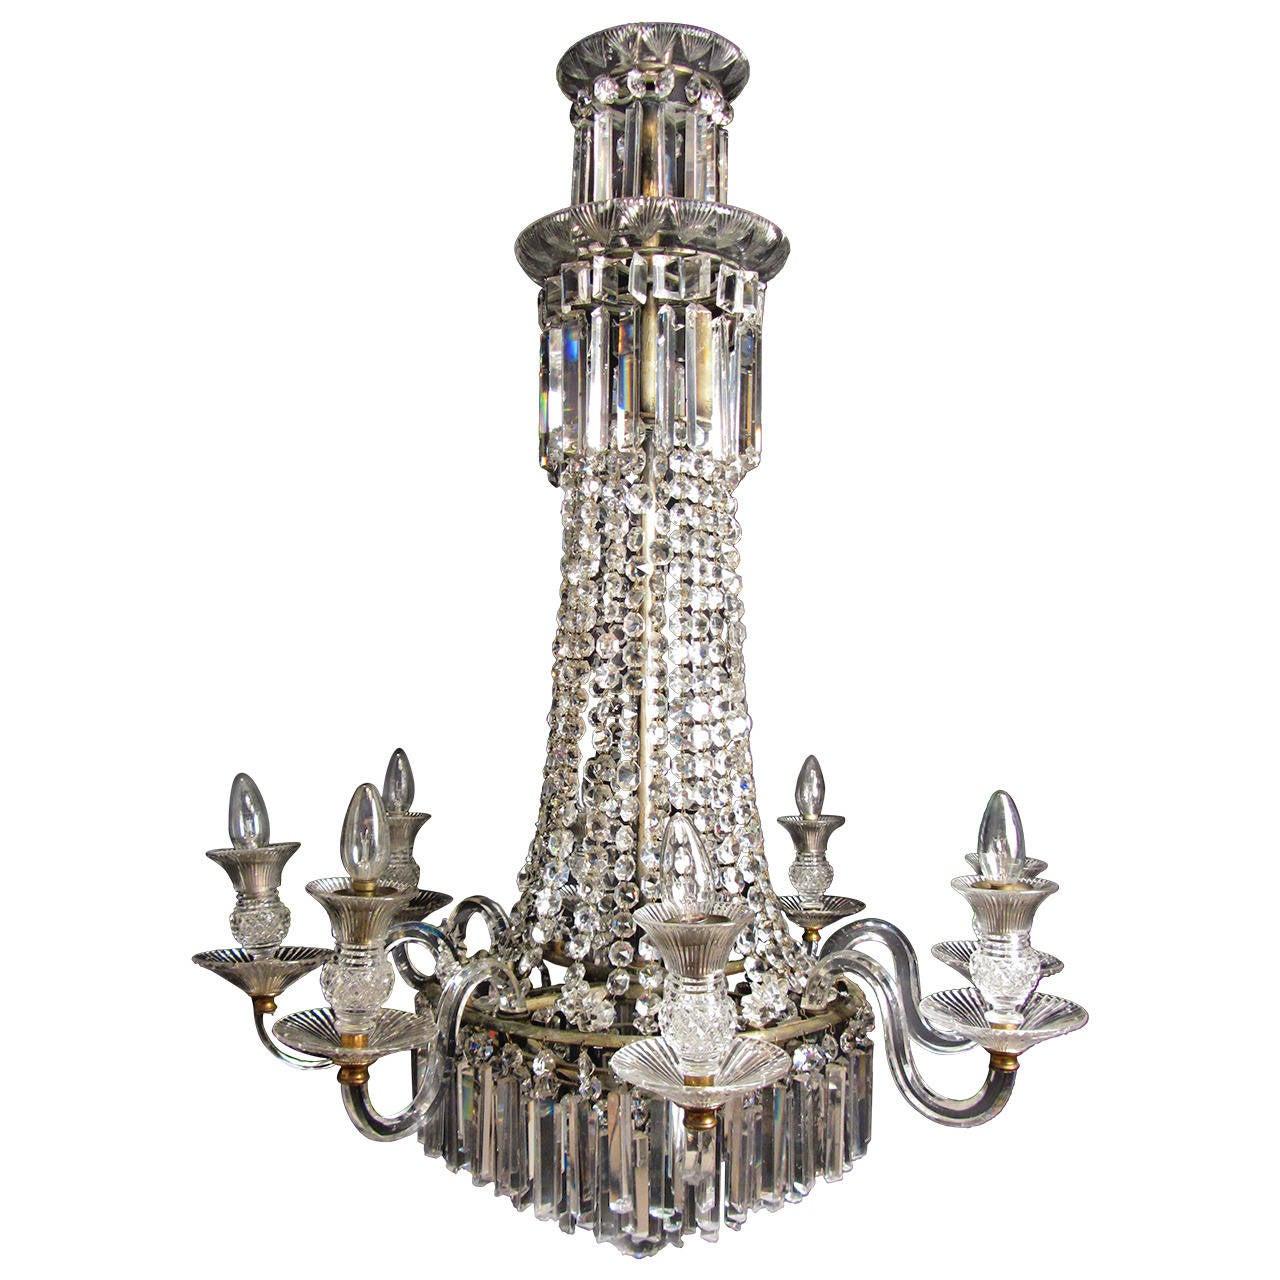 English regency chandelier for sale at 1stdibs english regency chandelier 1 mozeypictures Gallery